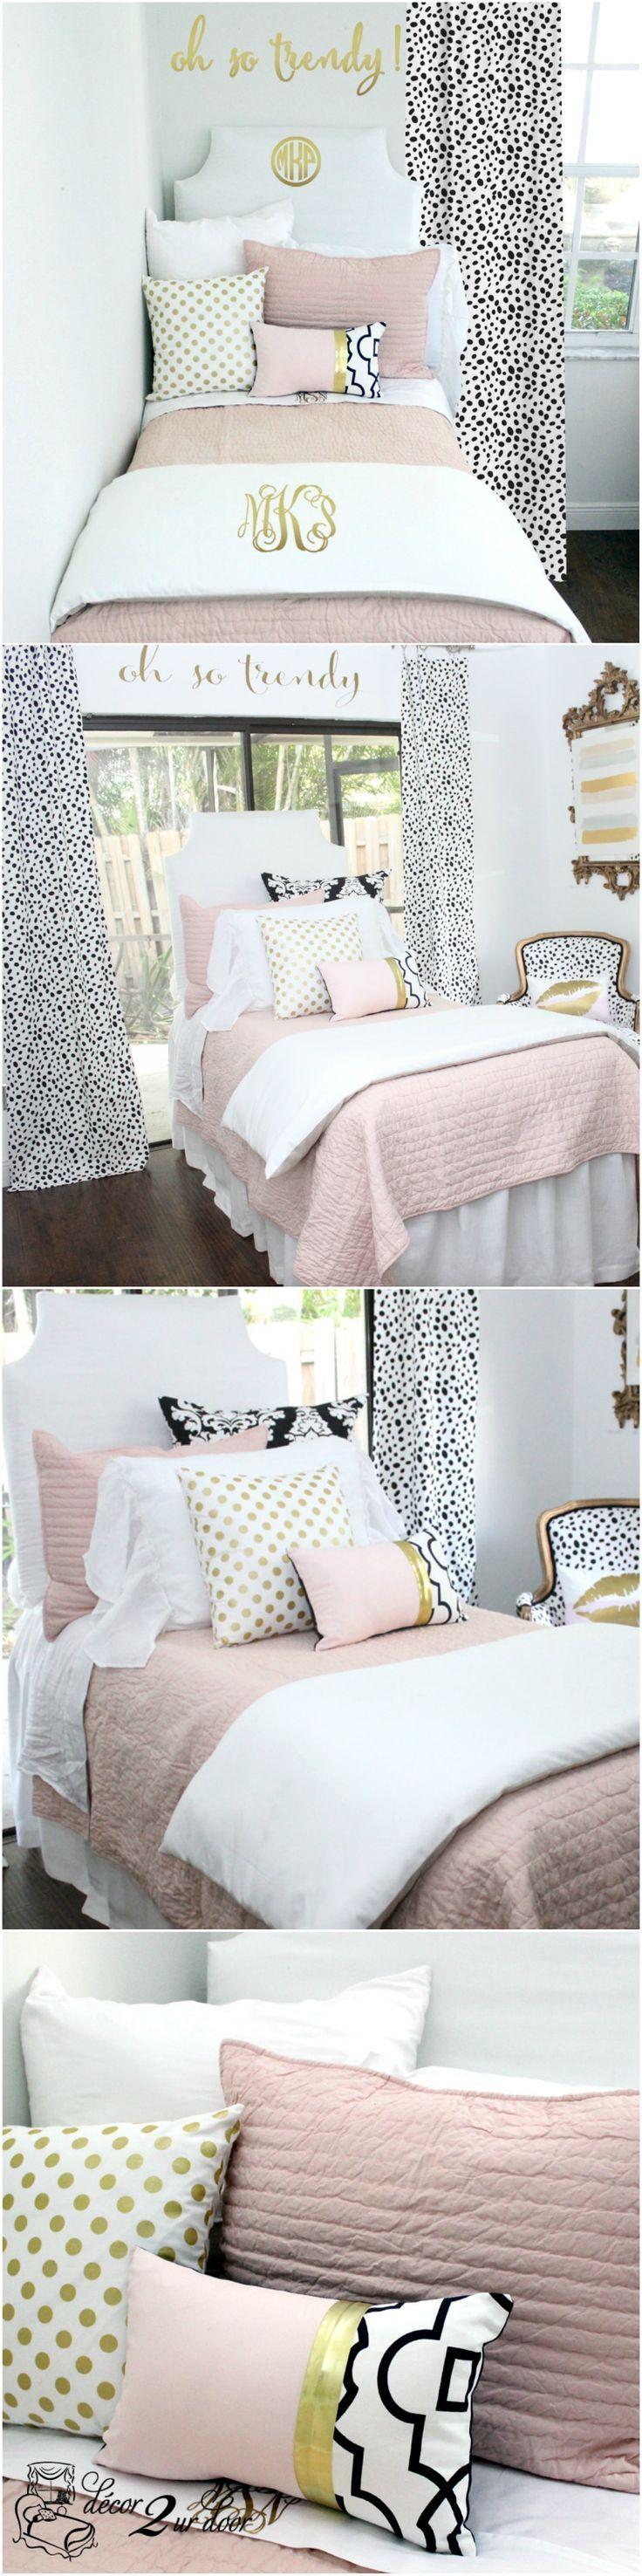 Ucf Dorm Room Bedding